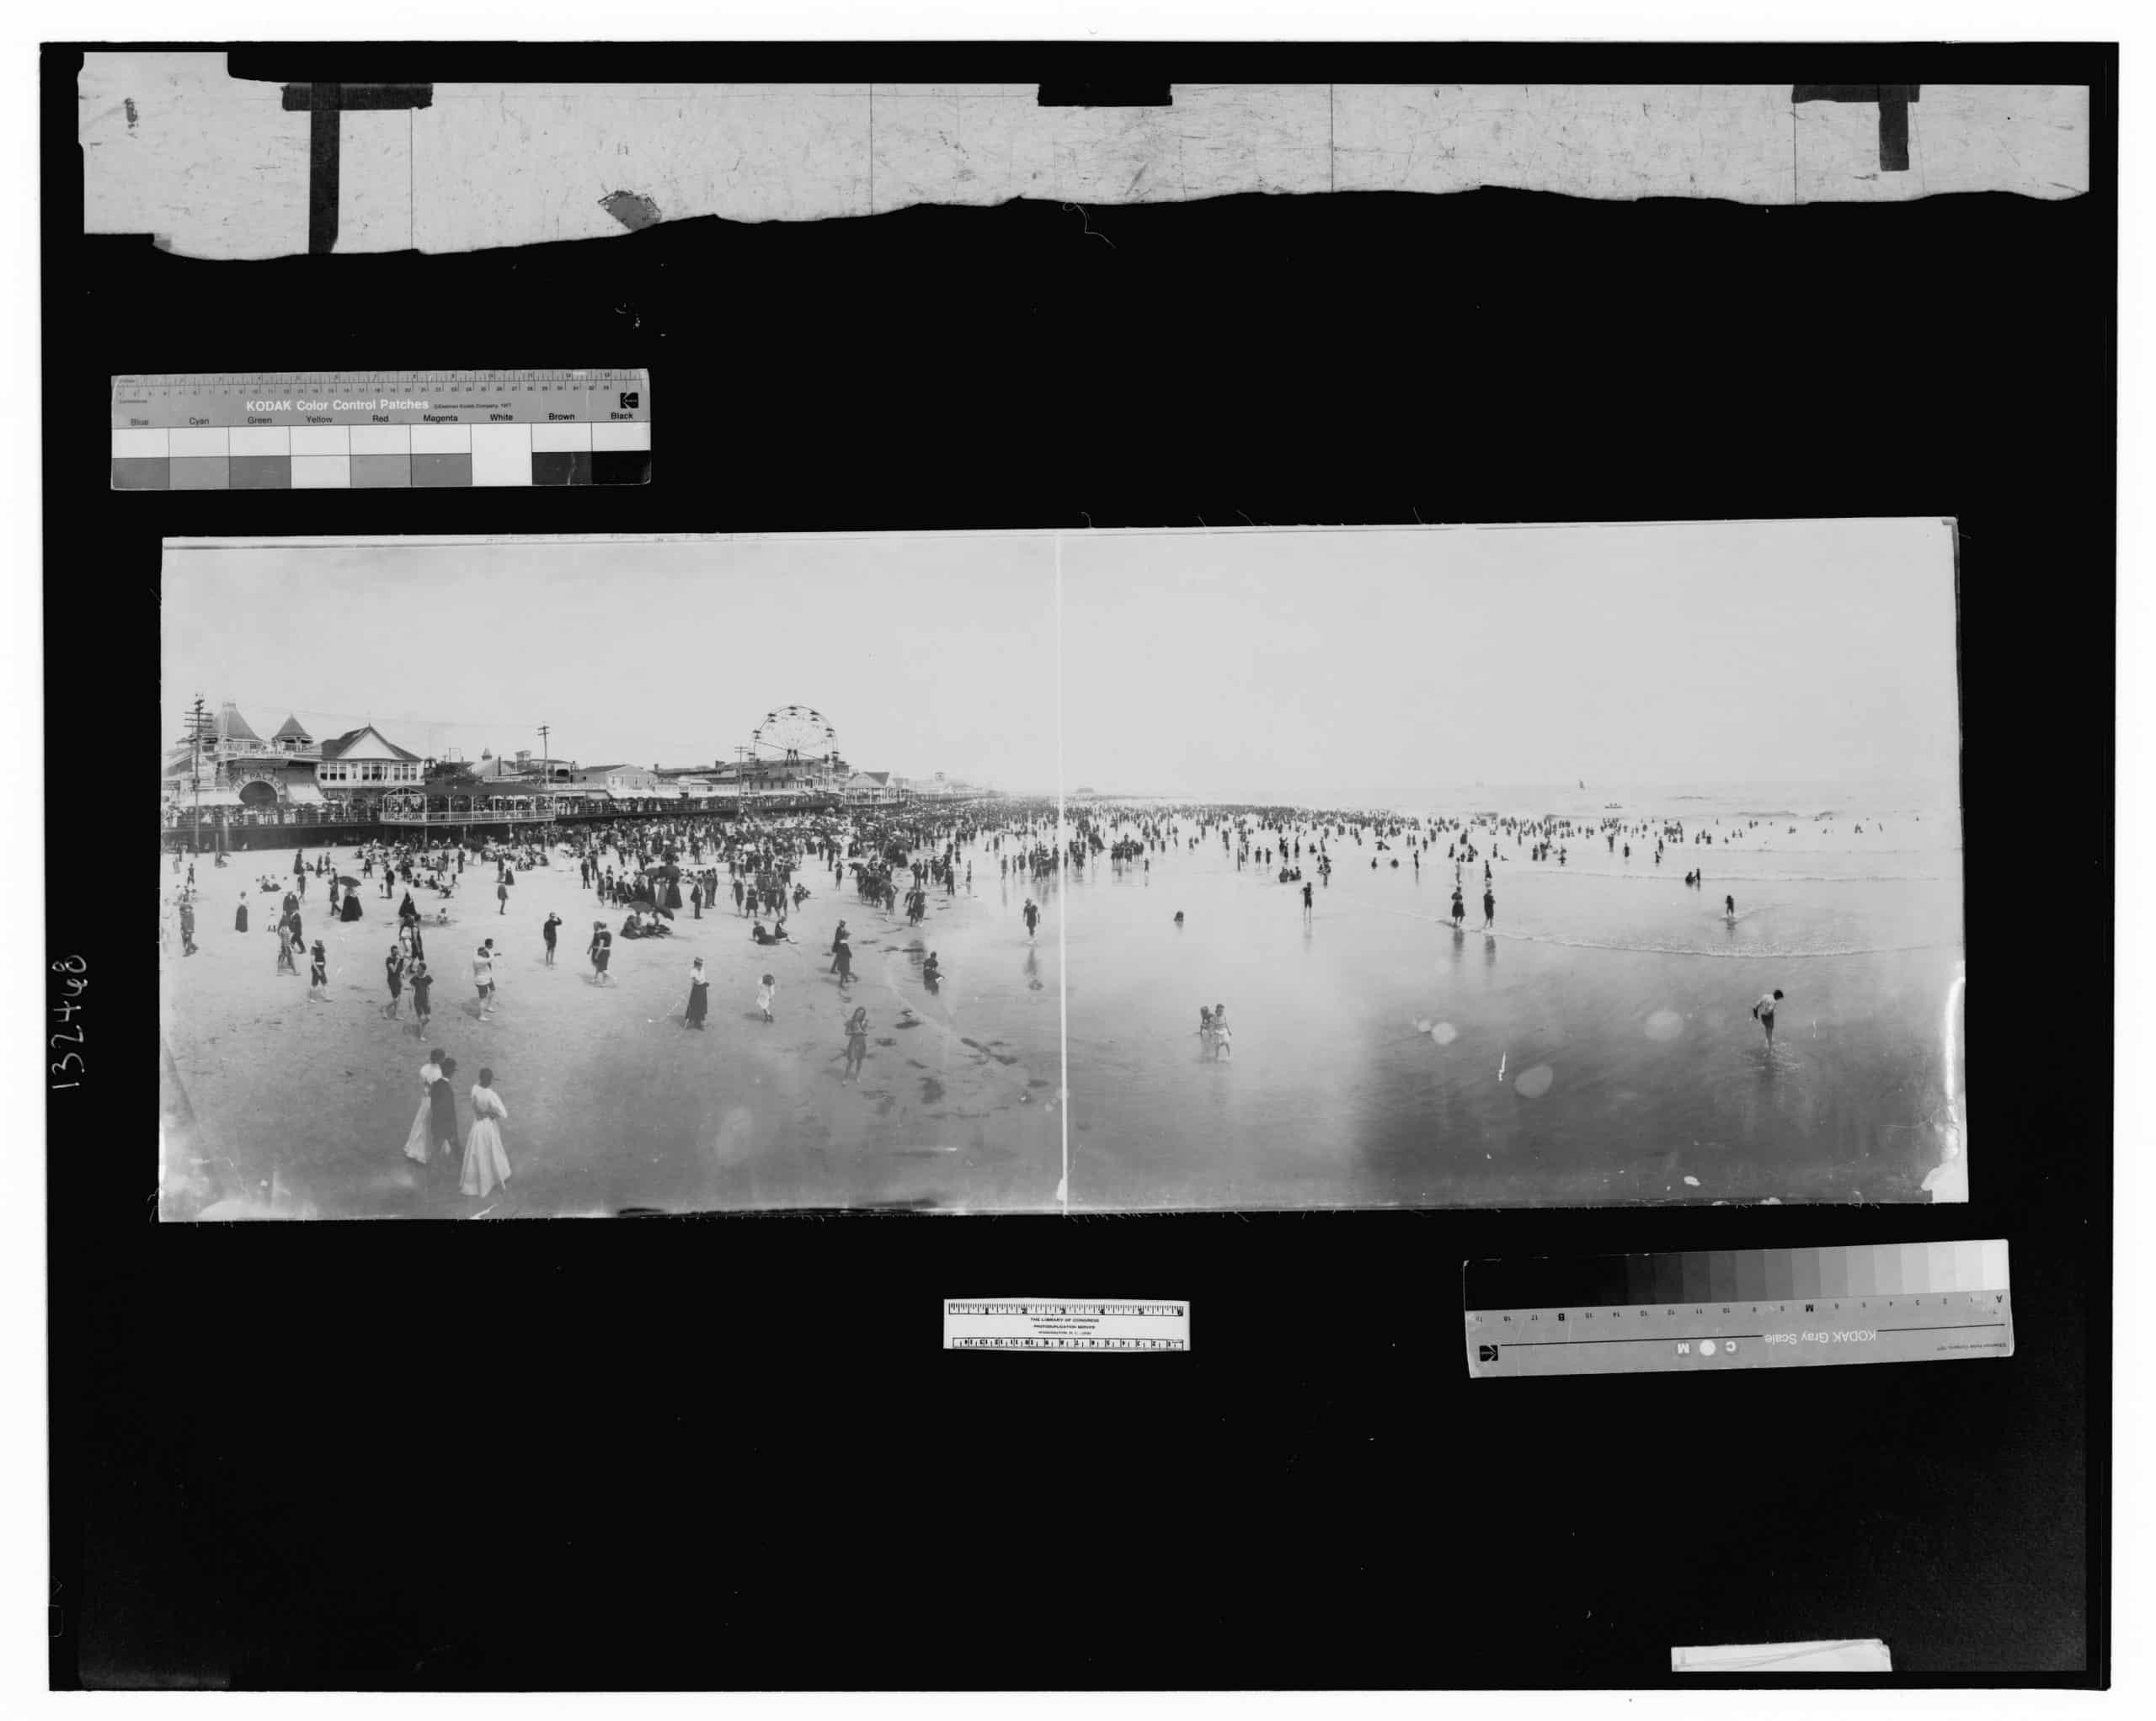 Atlantic City; panorama of beach and boardwalk from pier, William Herman Rau, ca. 1897